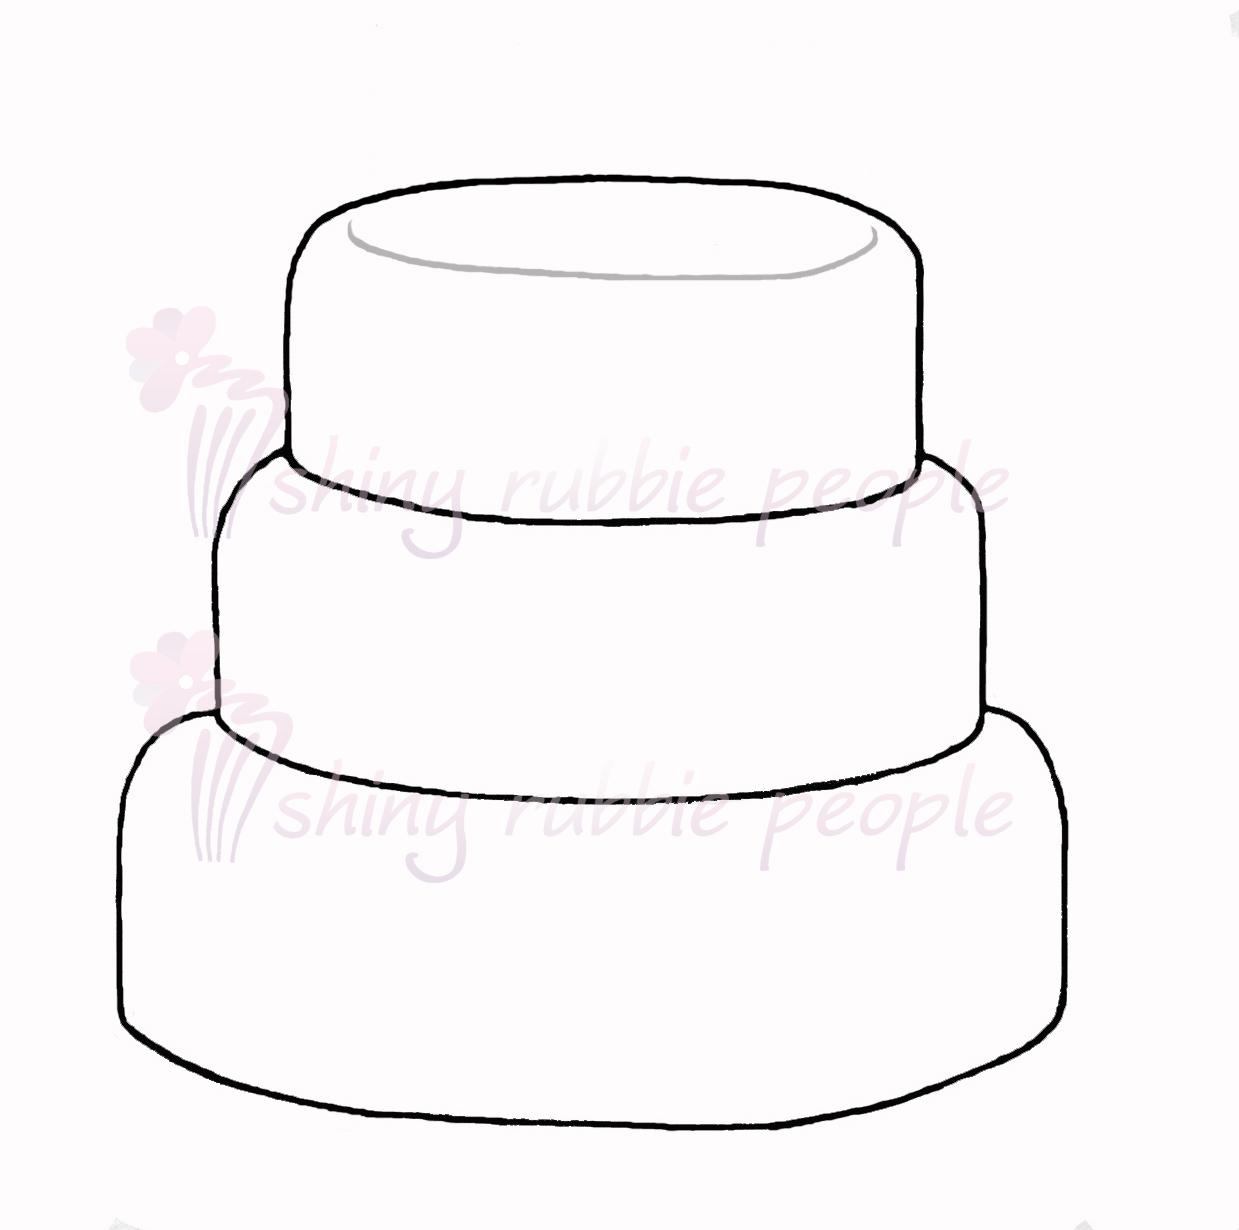 Wedding Cake clipart layer cake & Tips Shiny People Tricks